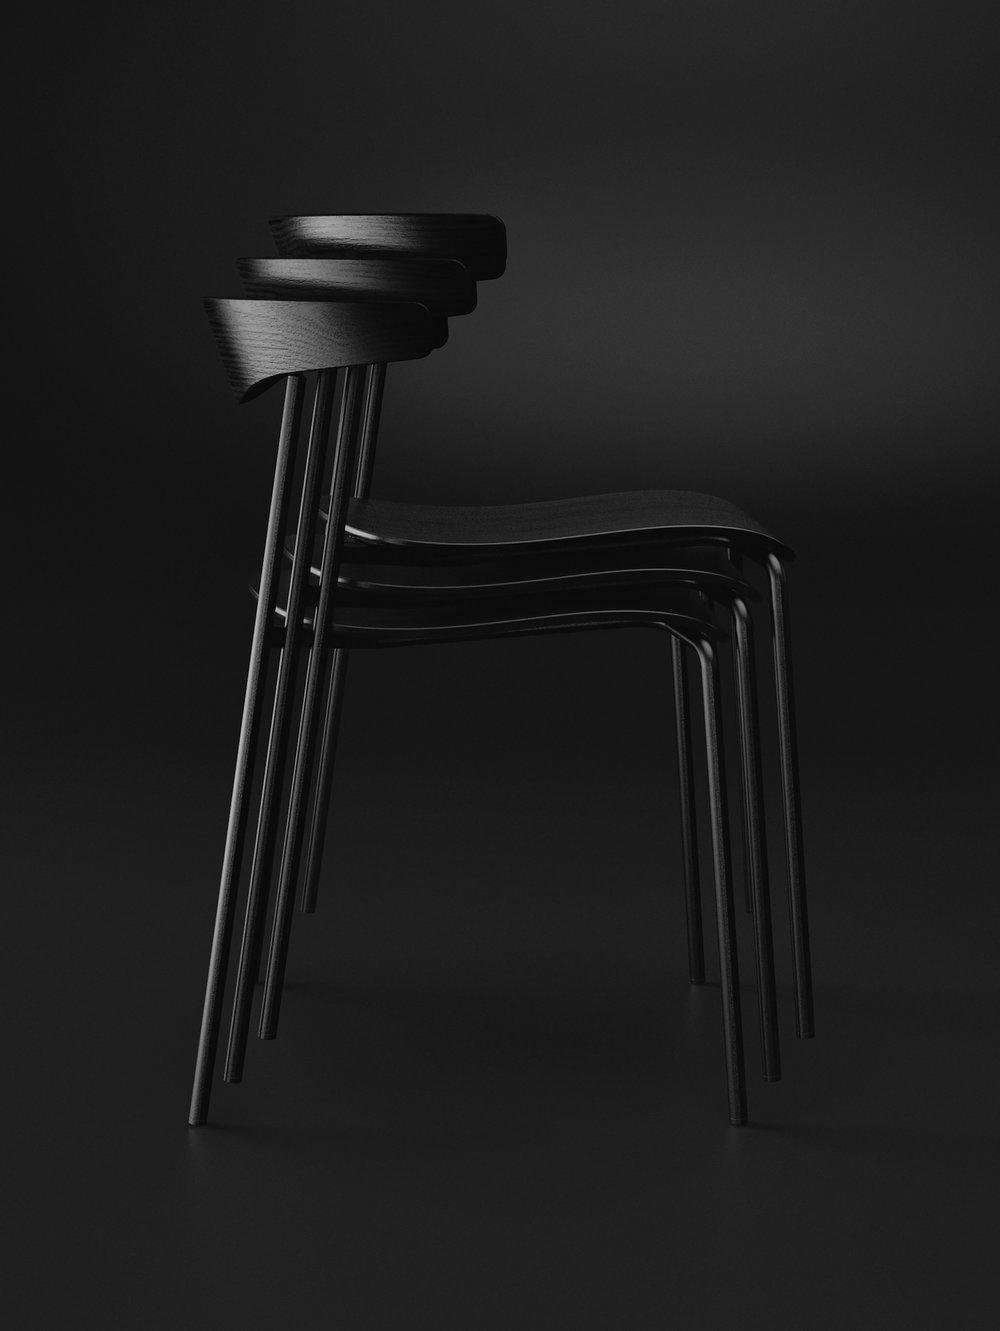 Hugchair designed Jens FagerforEdsbyn